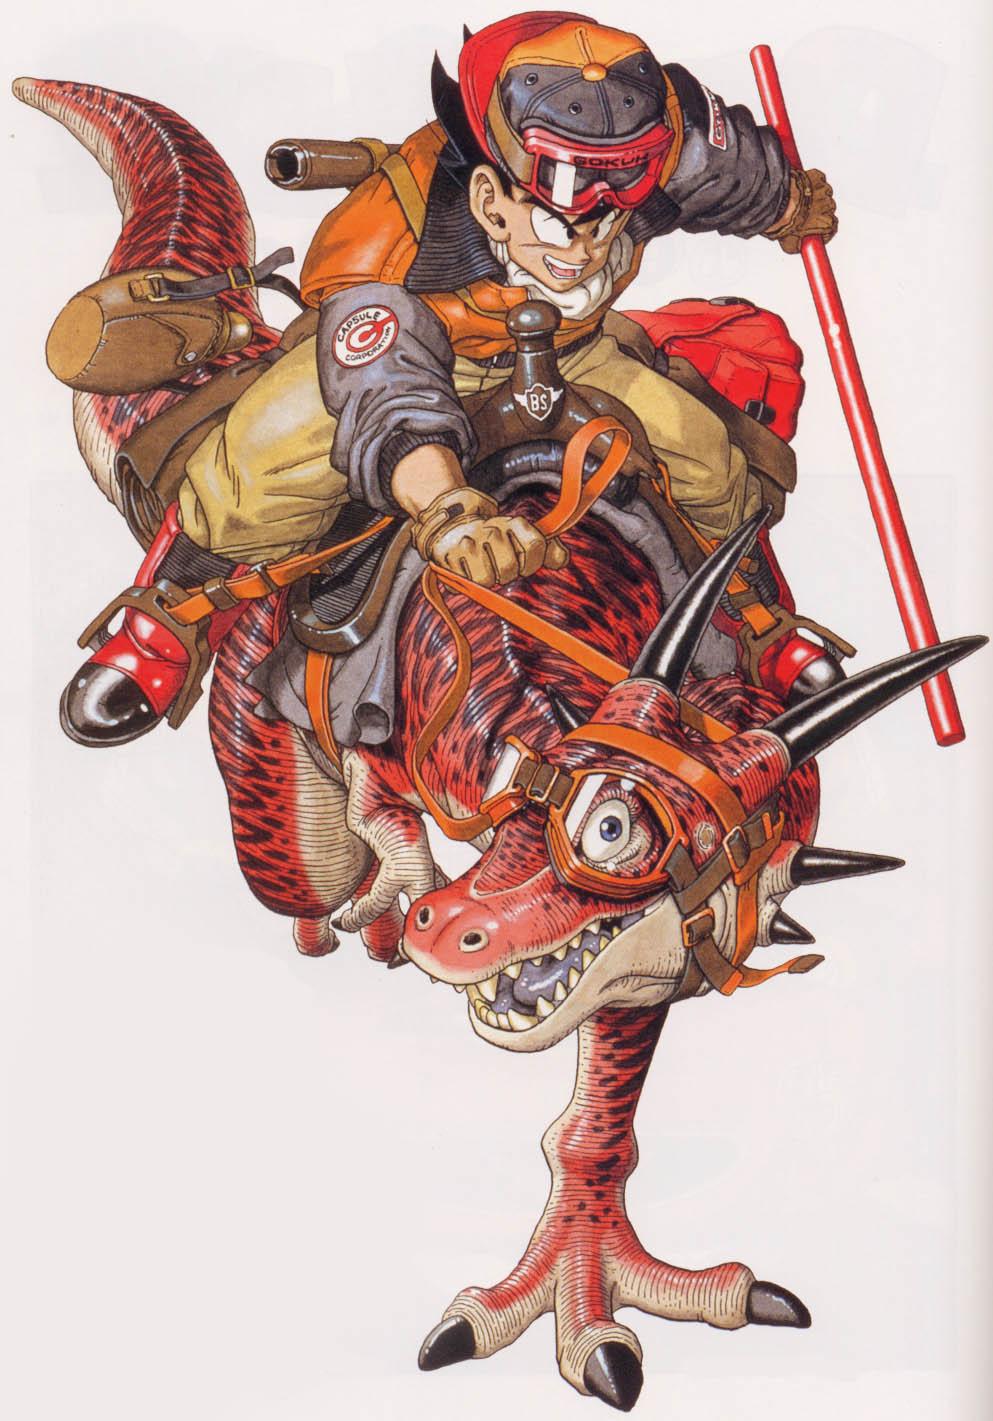 Akira-toriyama-manga-artista-dionisio-arte-03